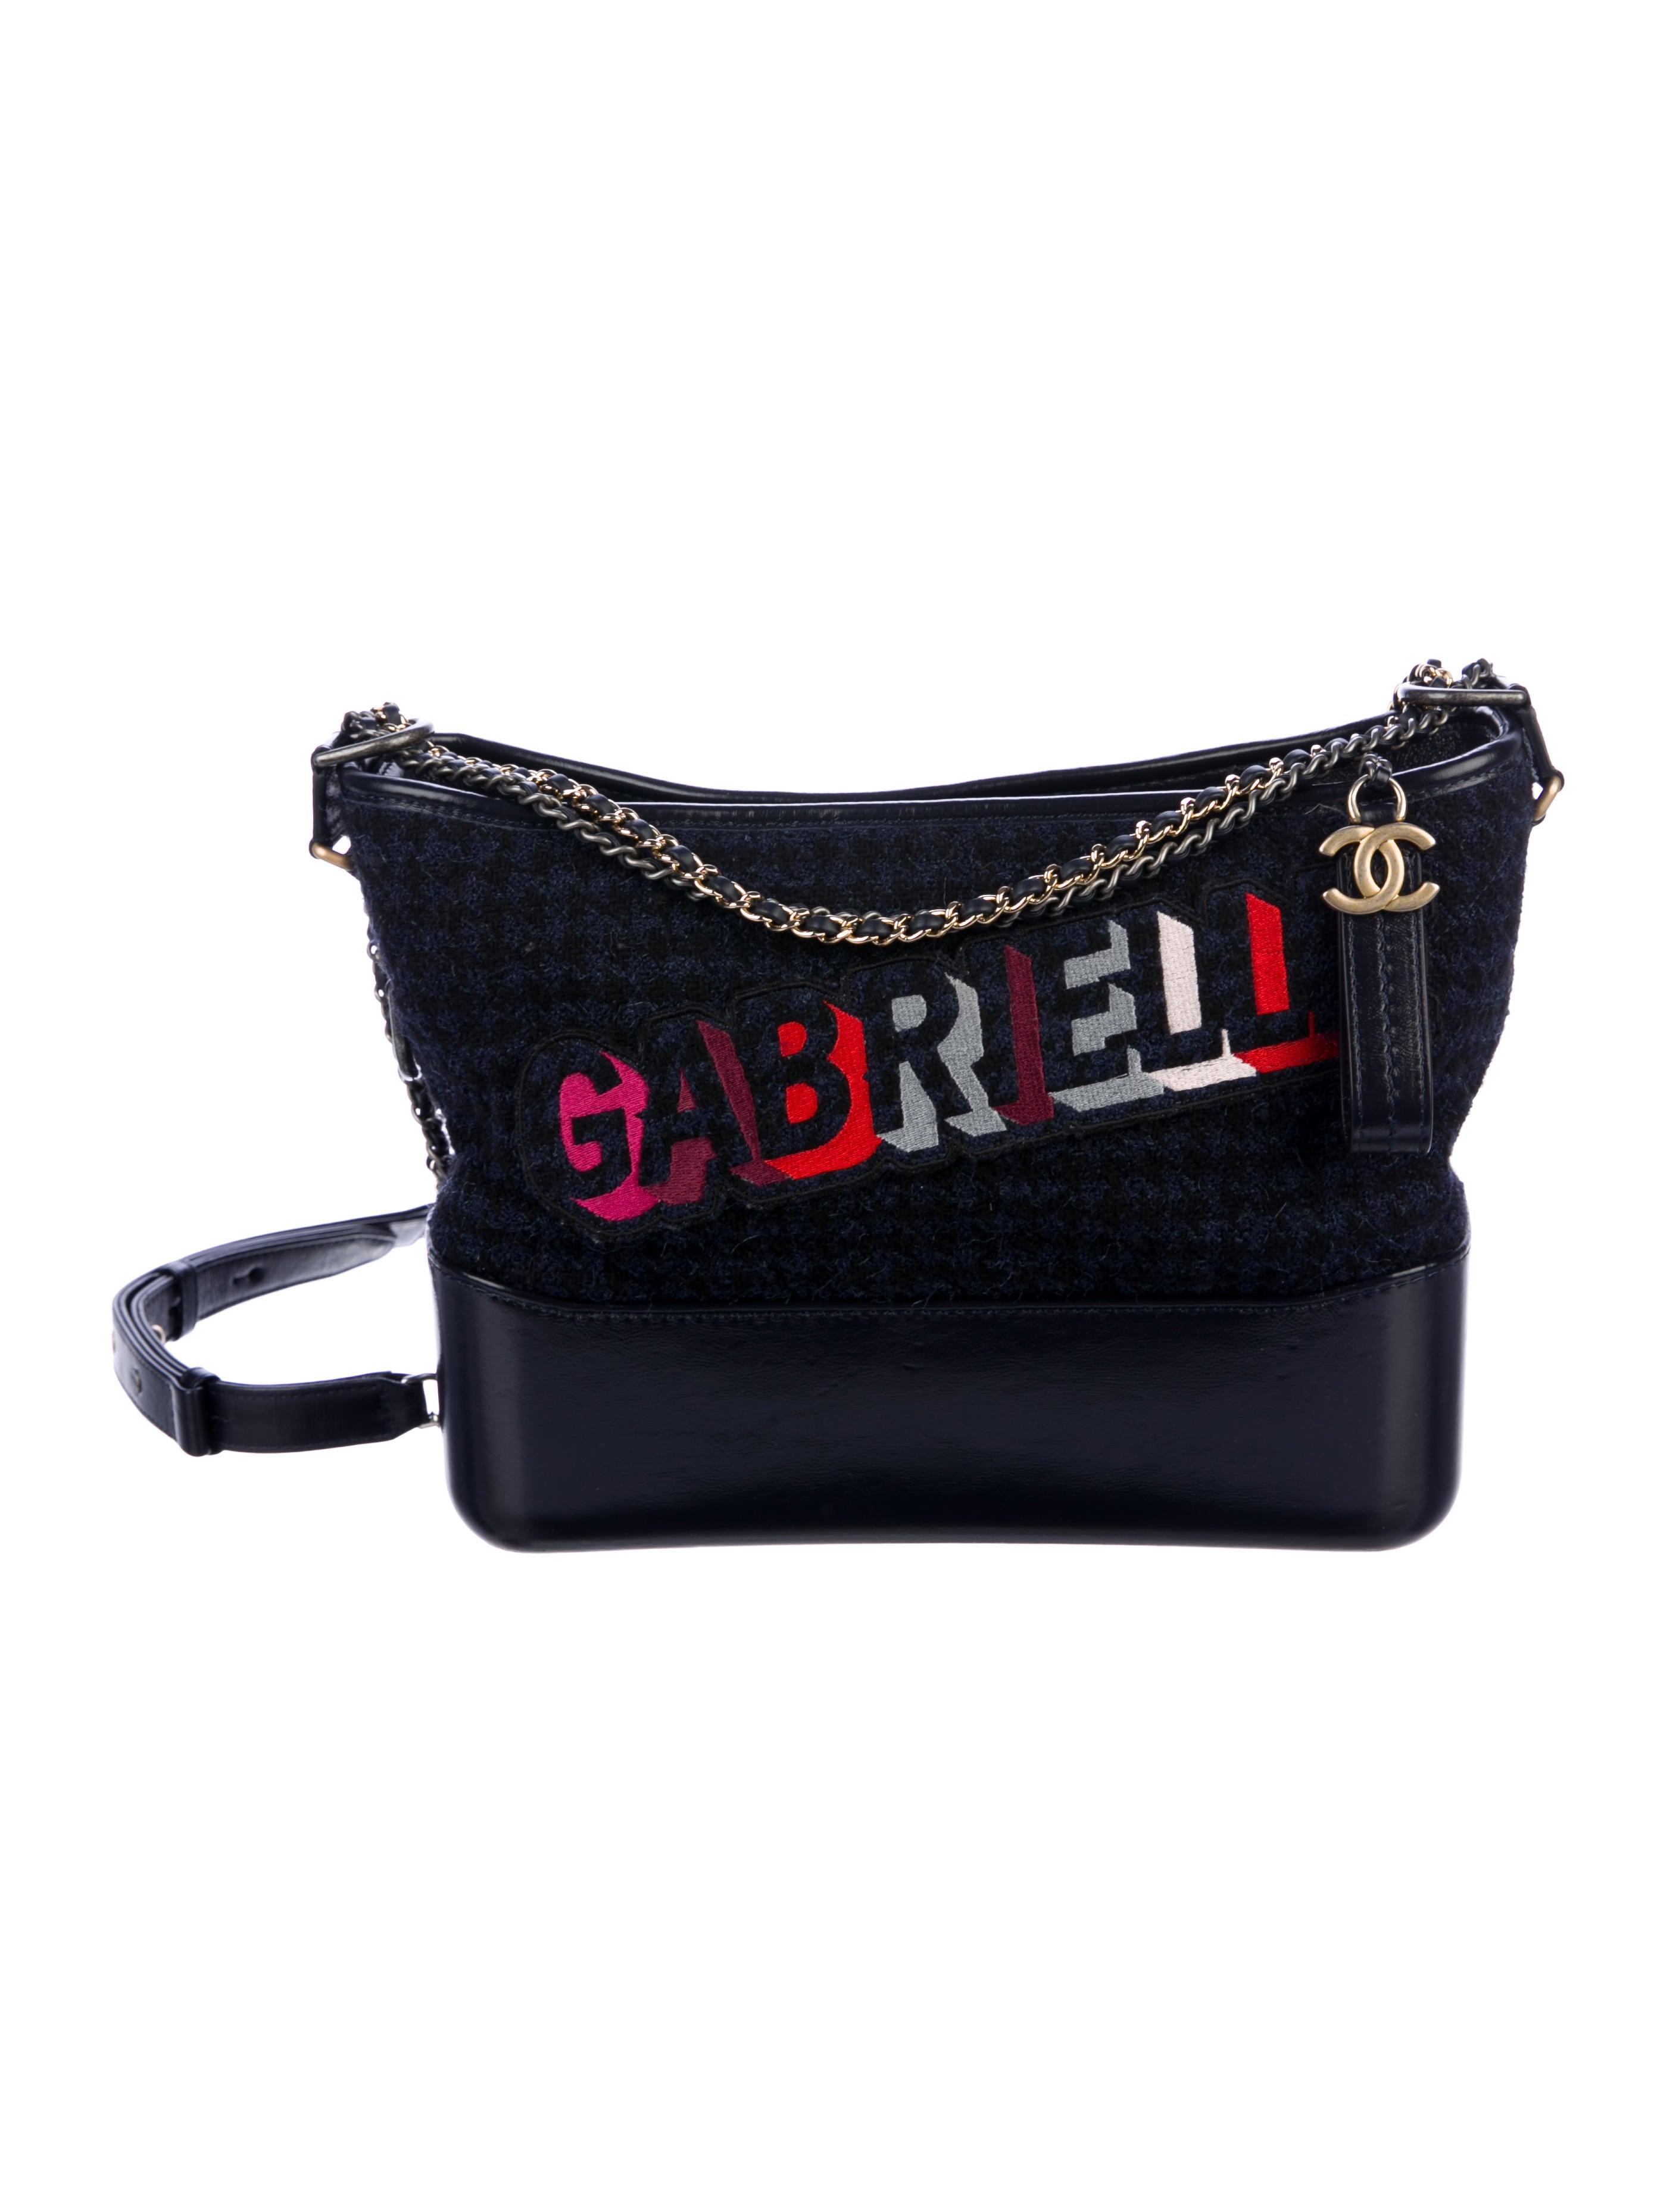 0eaca663fe50b7 Chanel 2017 Medium Tweed Gabrielle Hobo - Handbags - CHA276018 | The ...